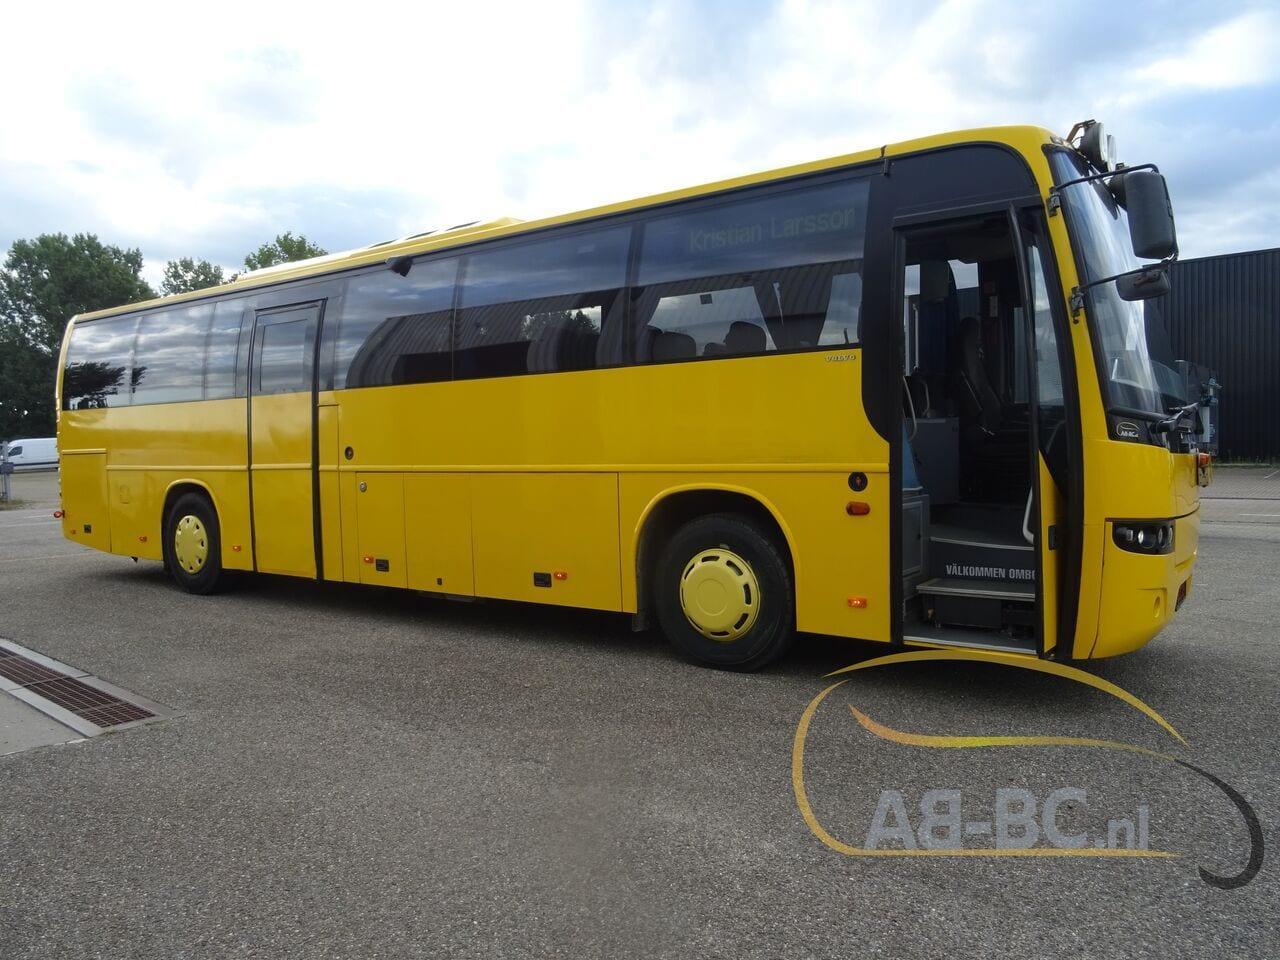 interurban-busVOLVO-B12M---1612871314378208245_big--20013112244271338300